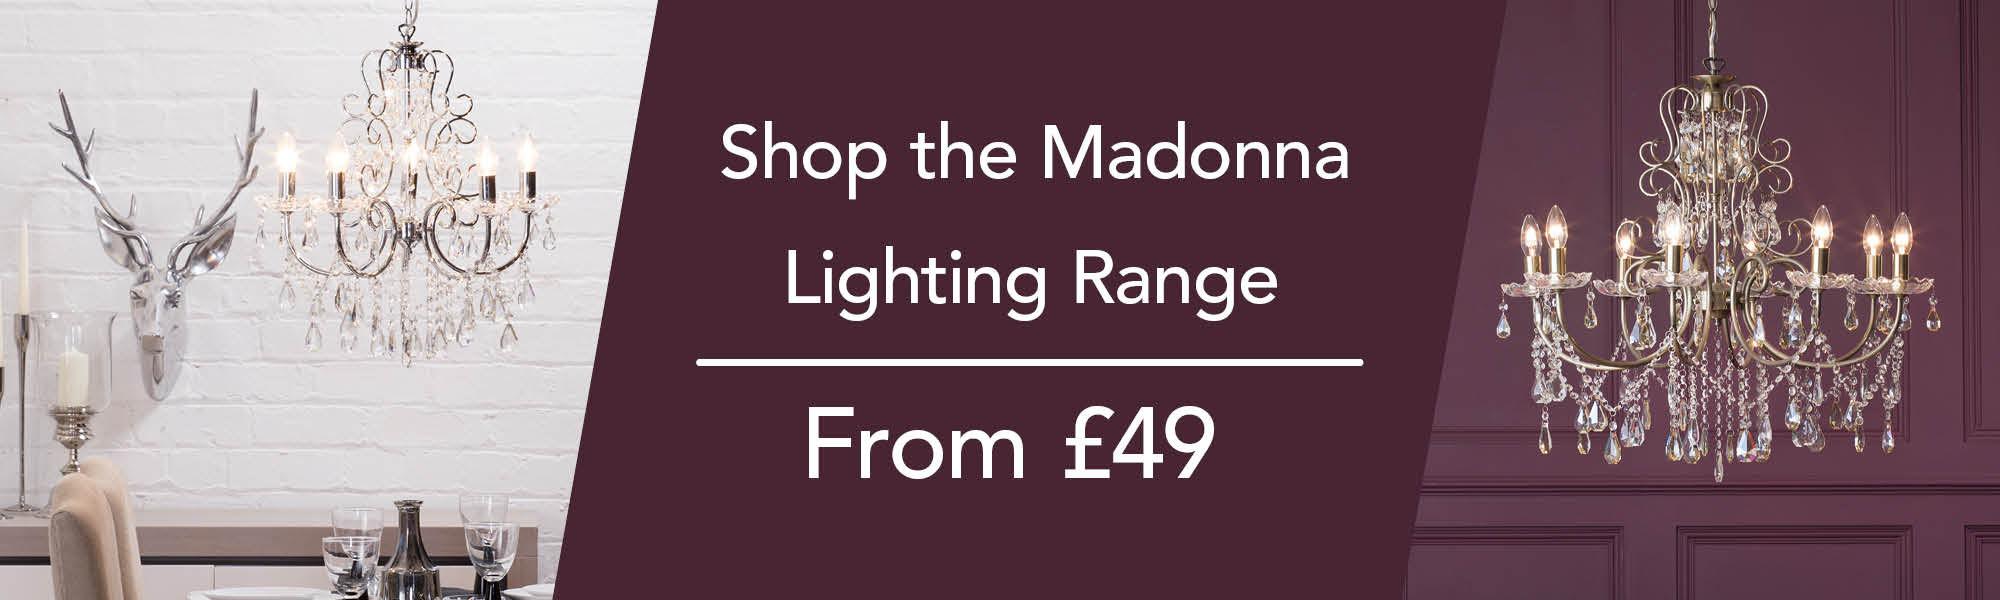 Shop the Madonna Lighting Range